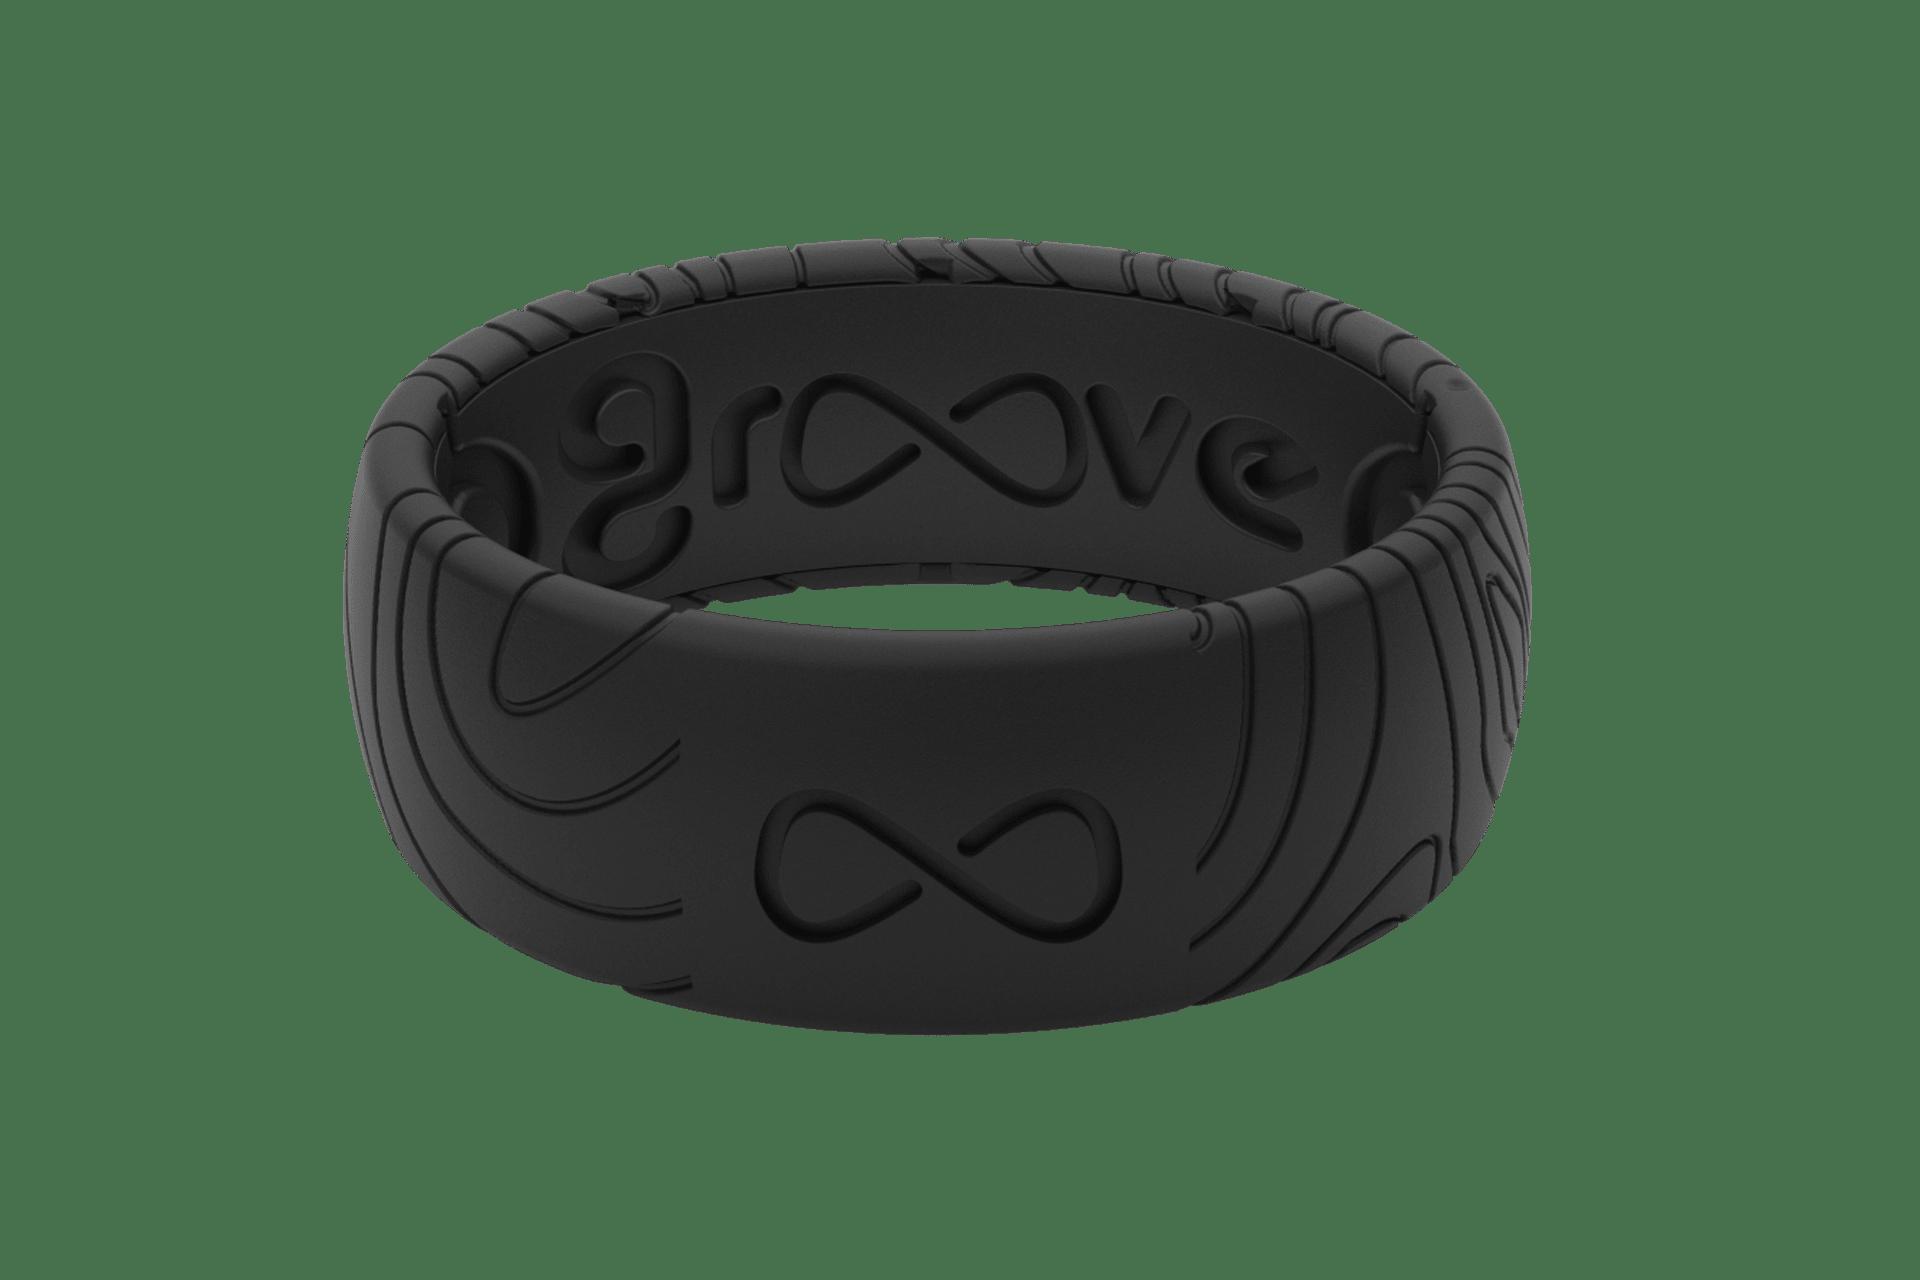 Original Dimension Topo Midnight Black - Groove Life Silicone Wedding Rings